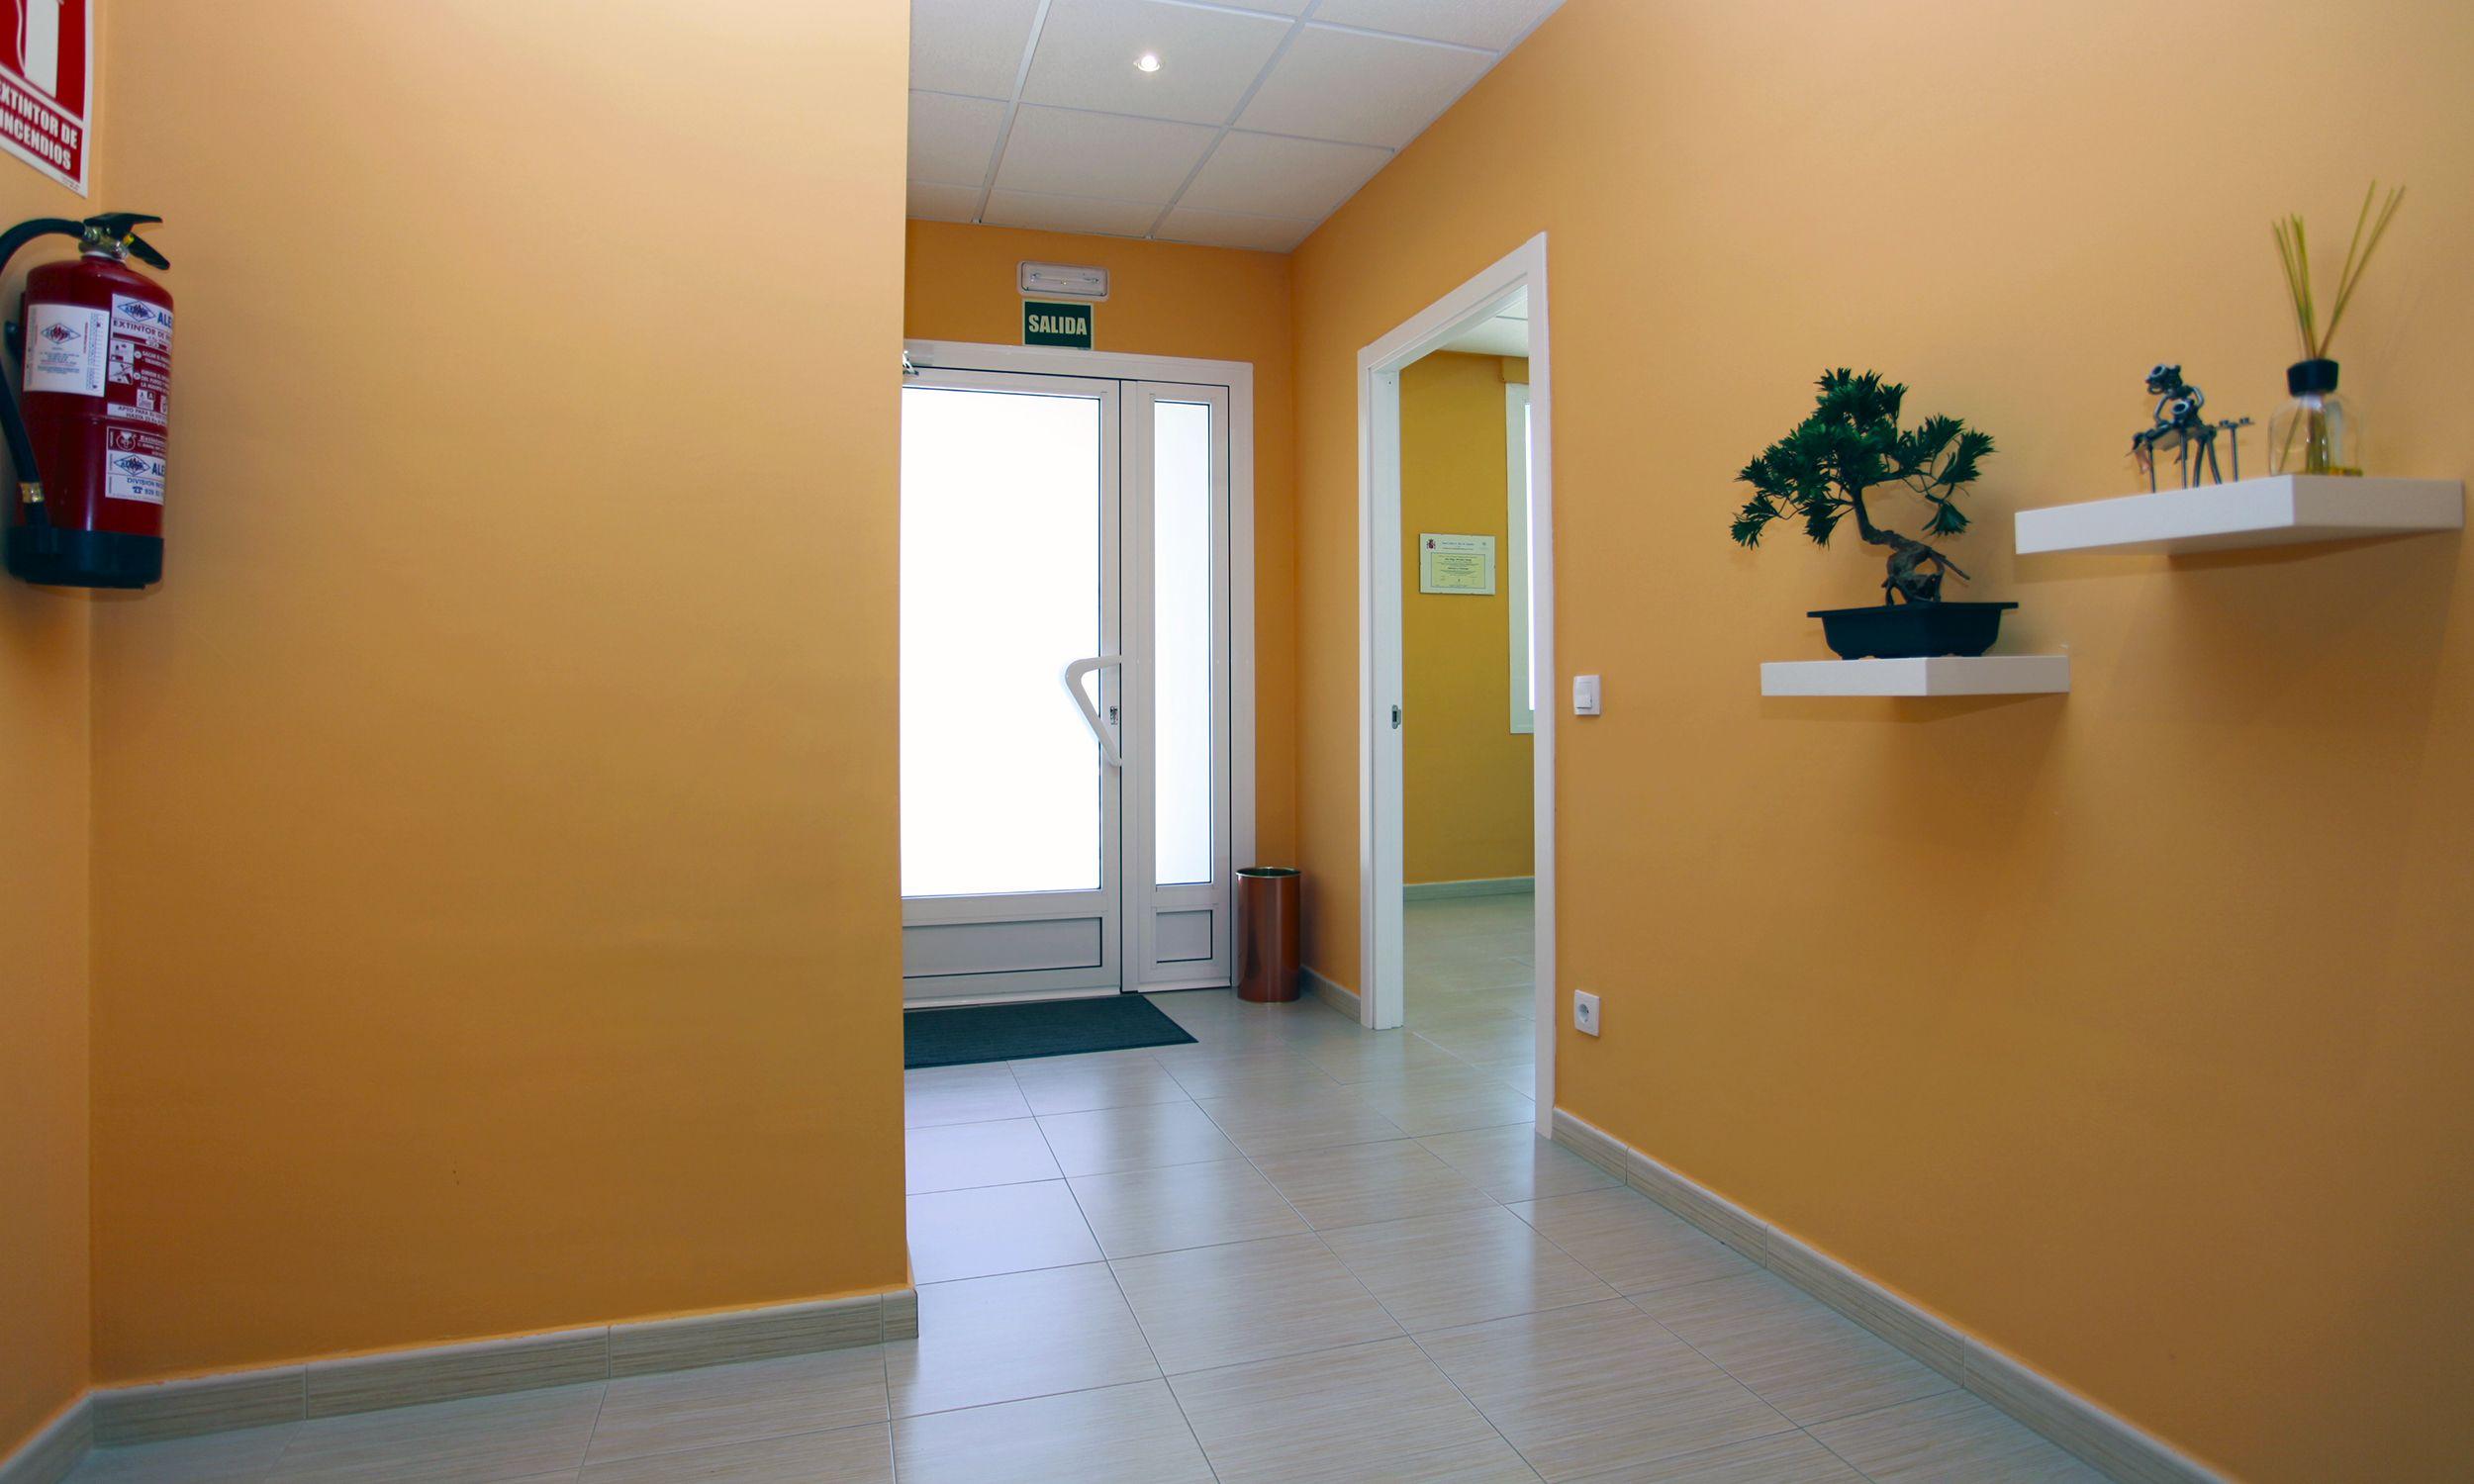 Fisioterapeuta en Madridejos, Toledo